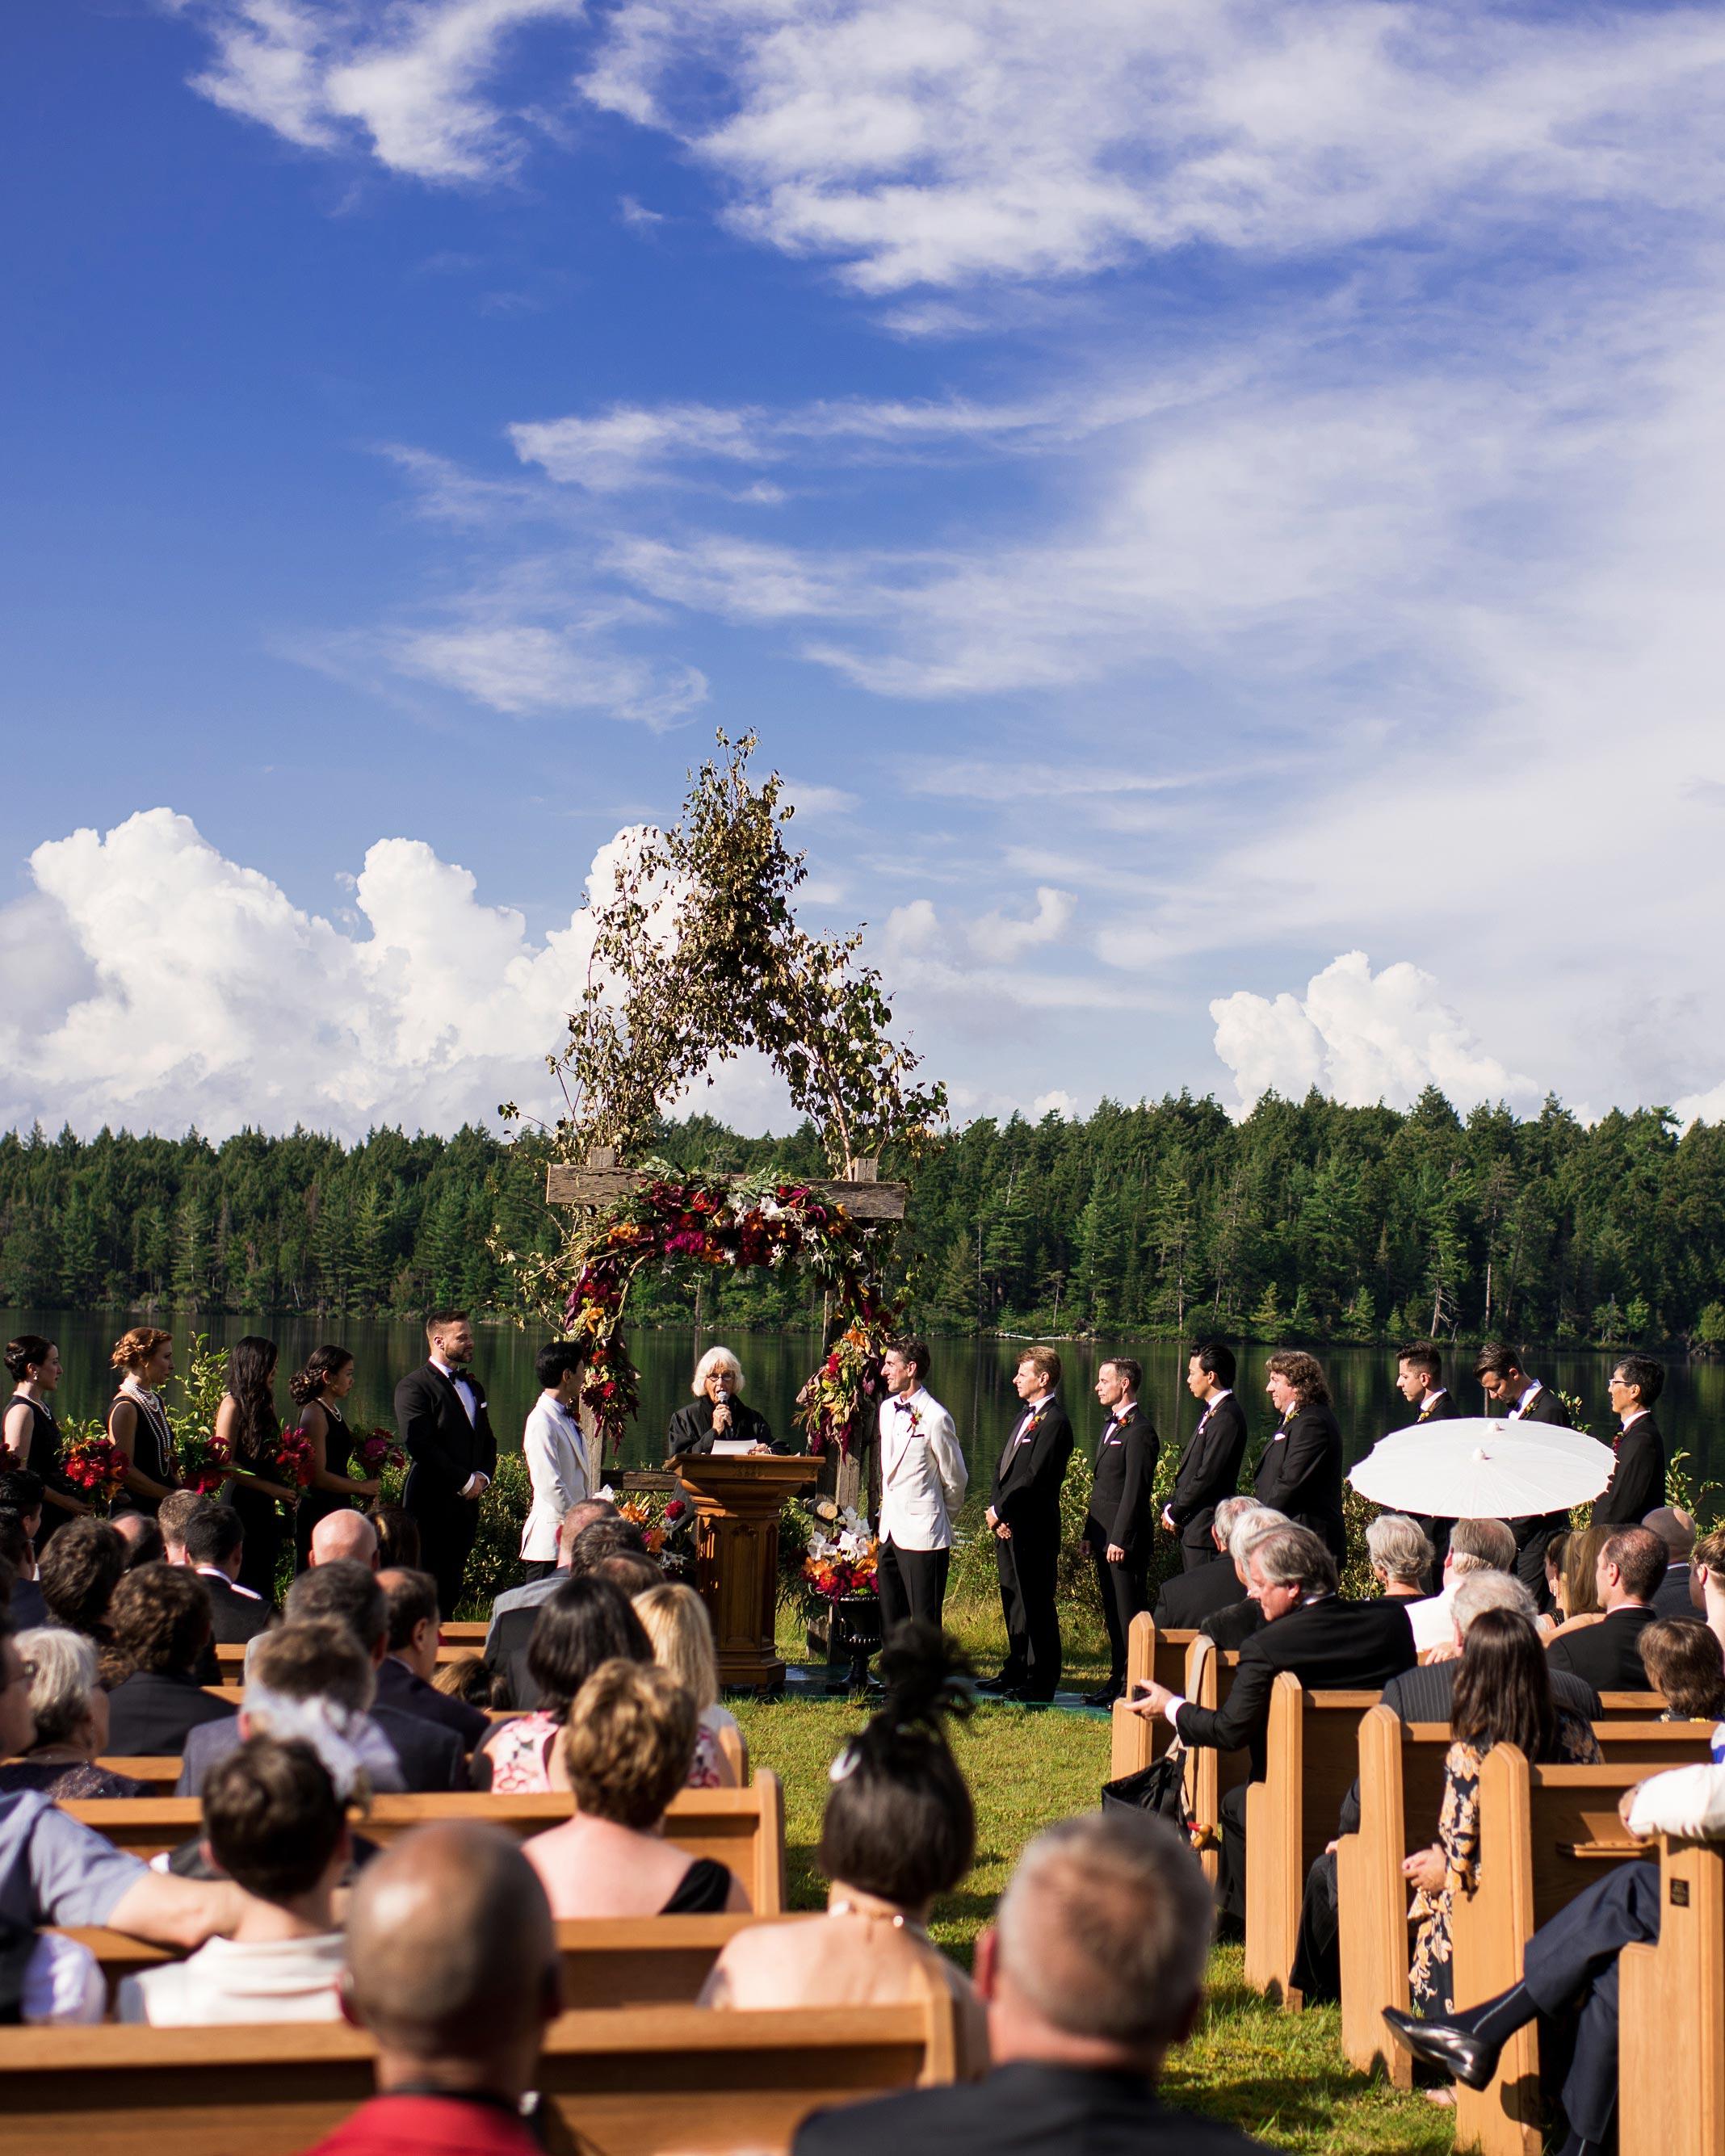 christopher-stephen-wedding-ceremony-0544-s112787-0416.jpg